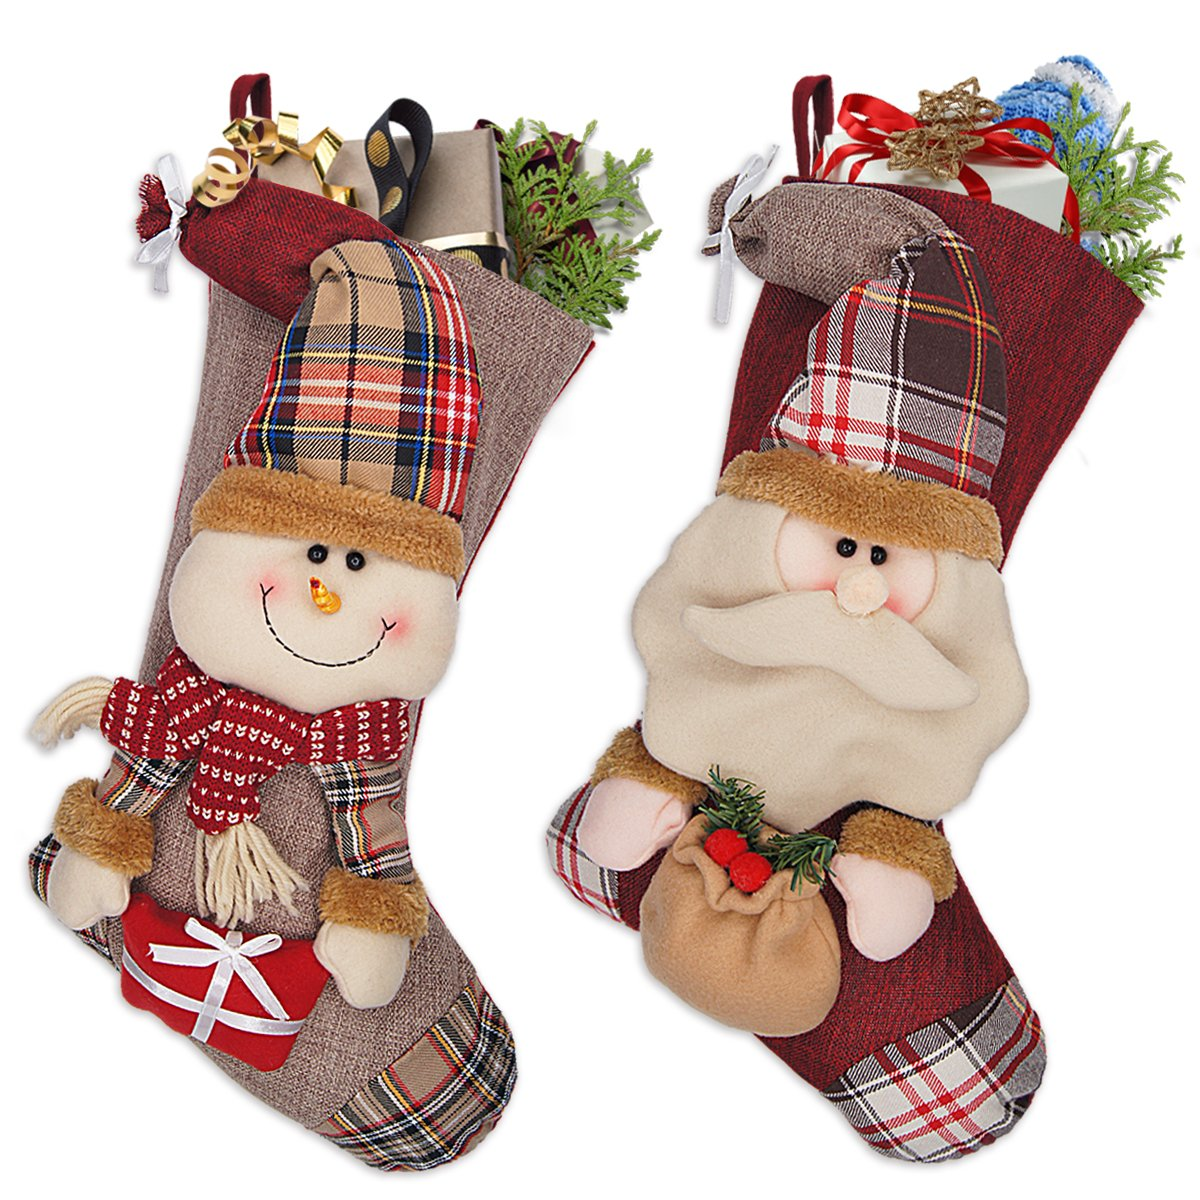 LimBridge 18'' Burlap 3D Christmas Stockings, Santa & Snowman, Set of 2